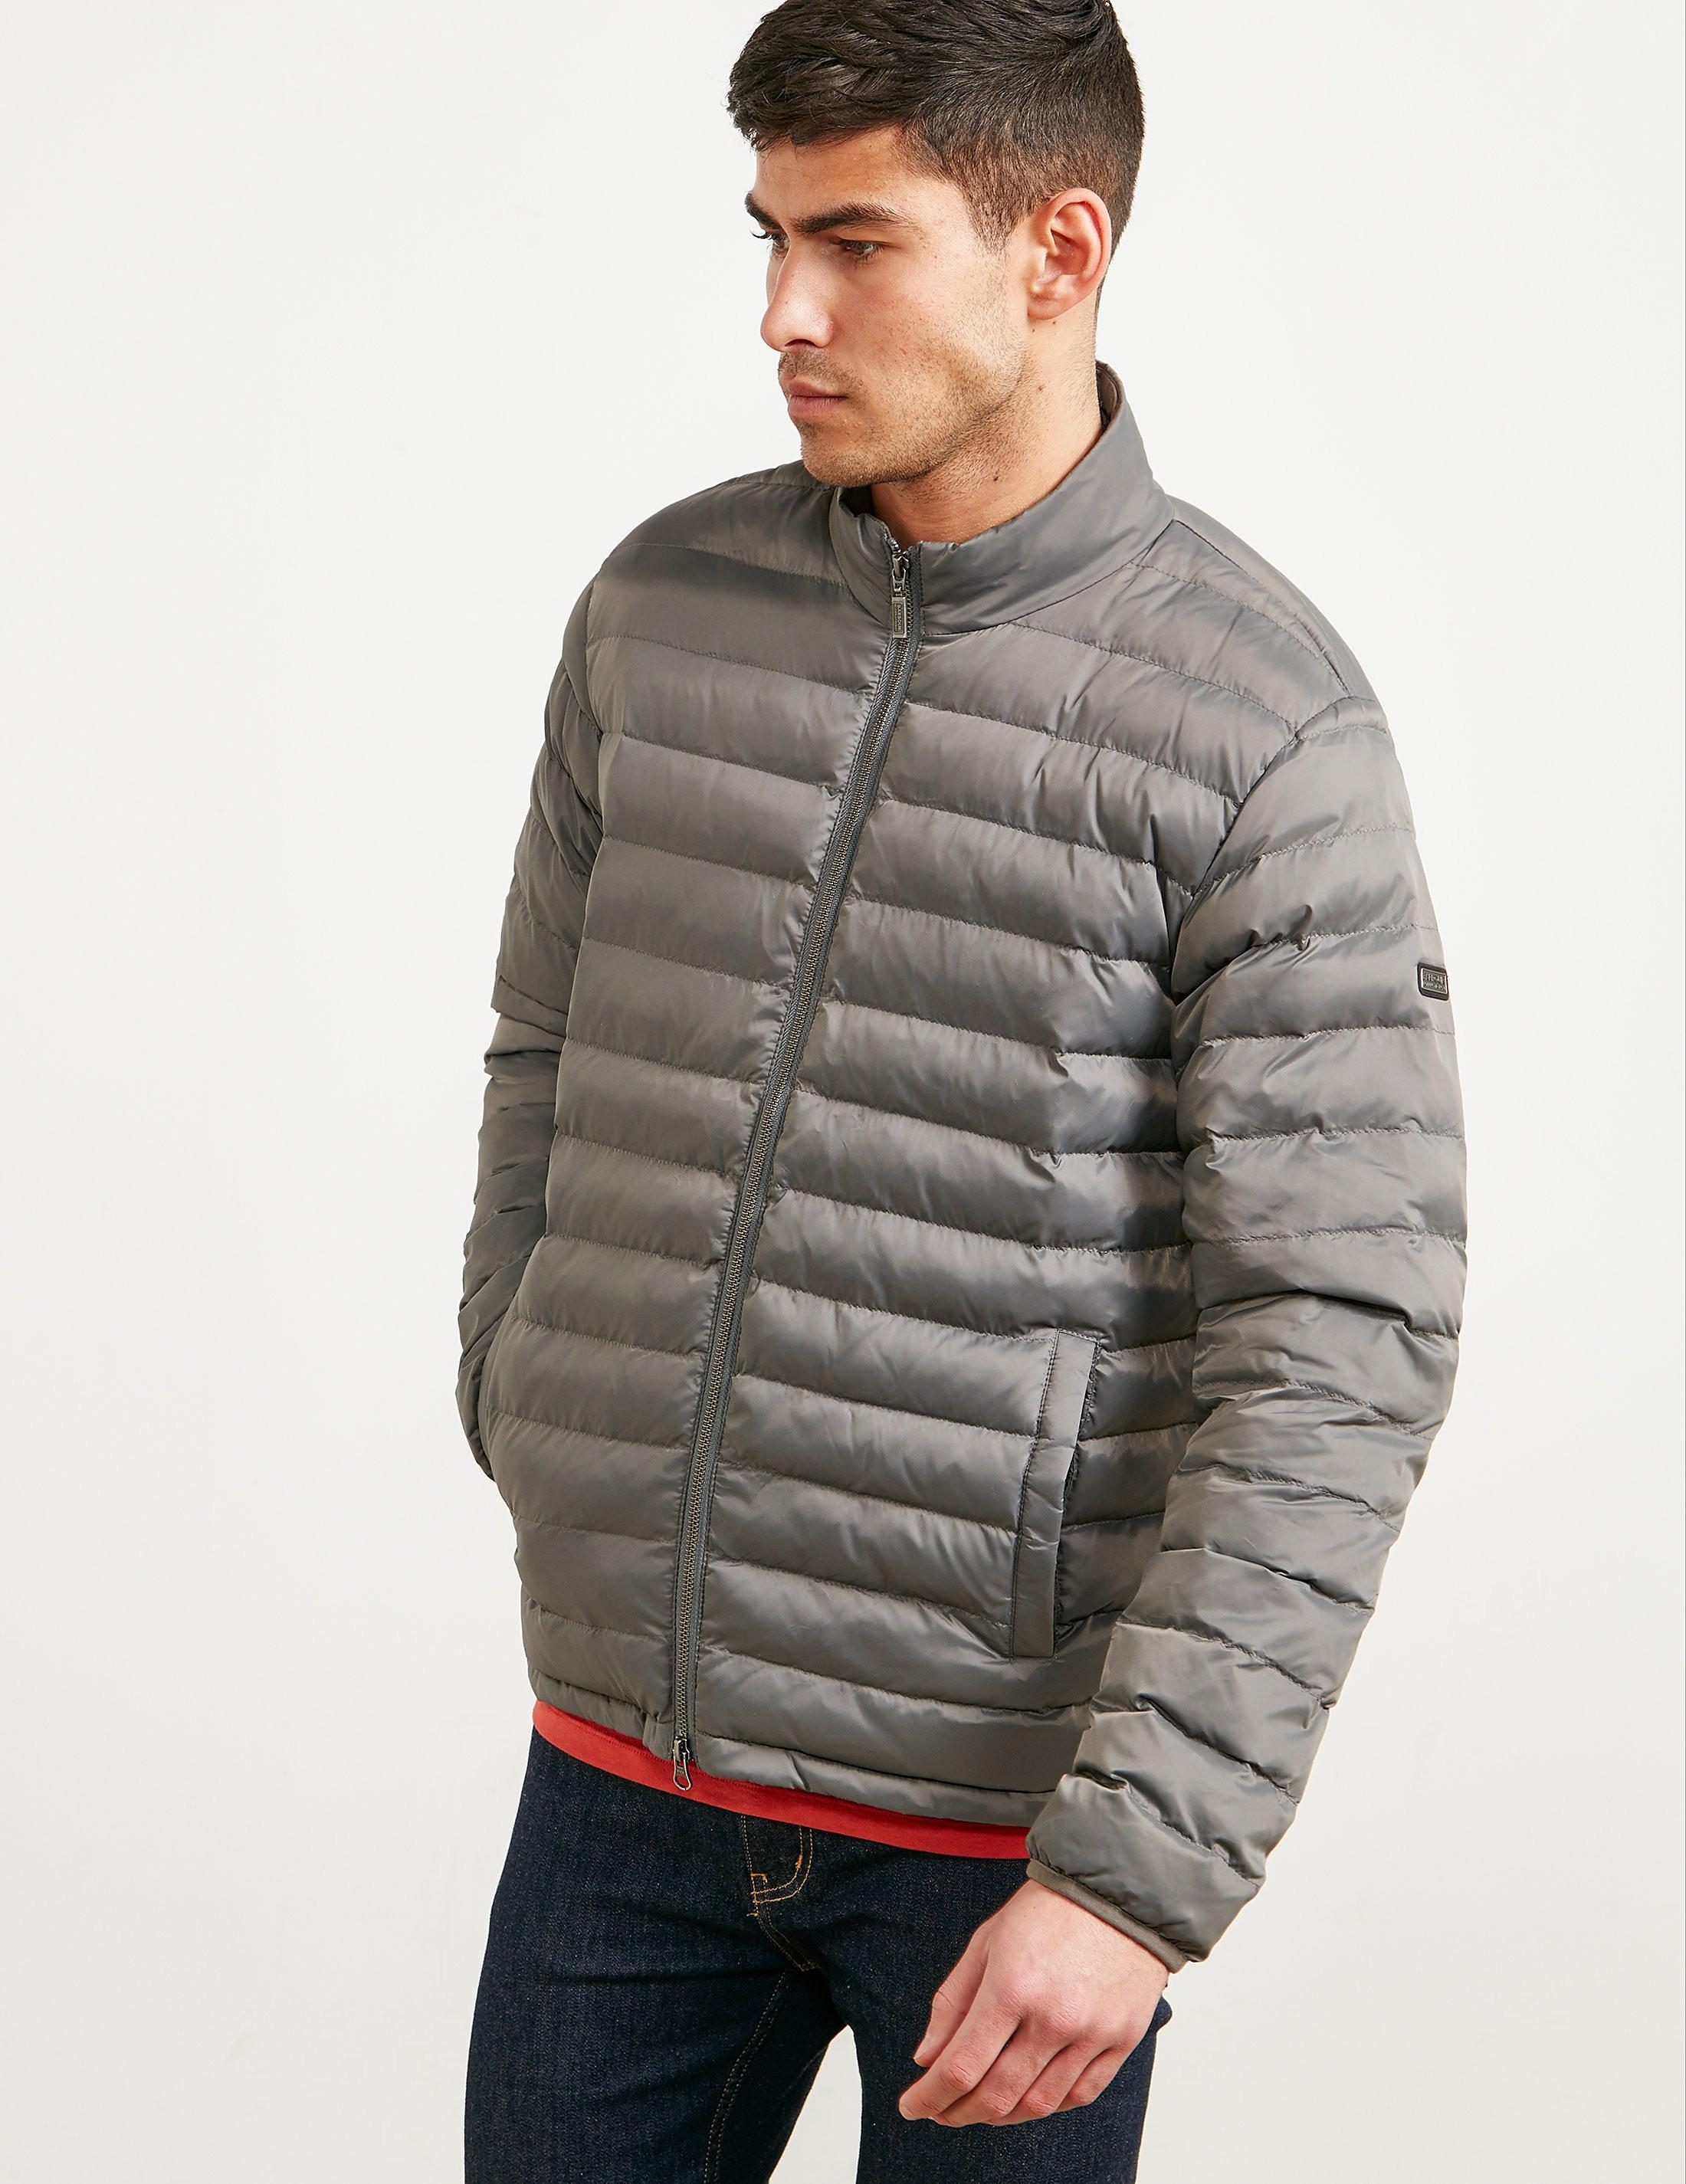 Barbour International Impeller Padded Jacket